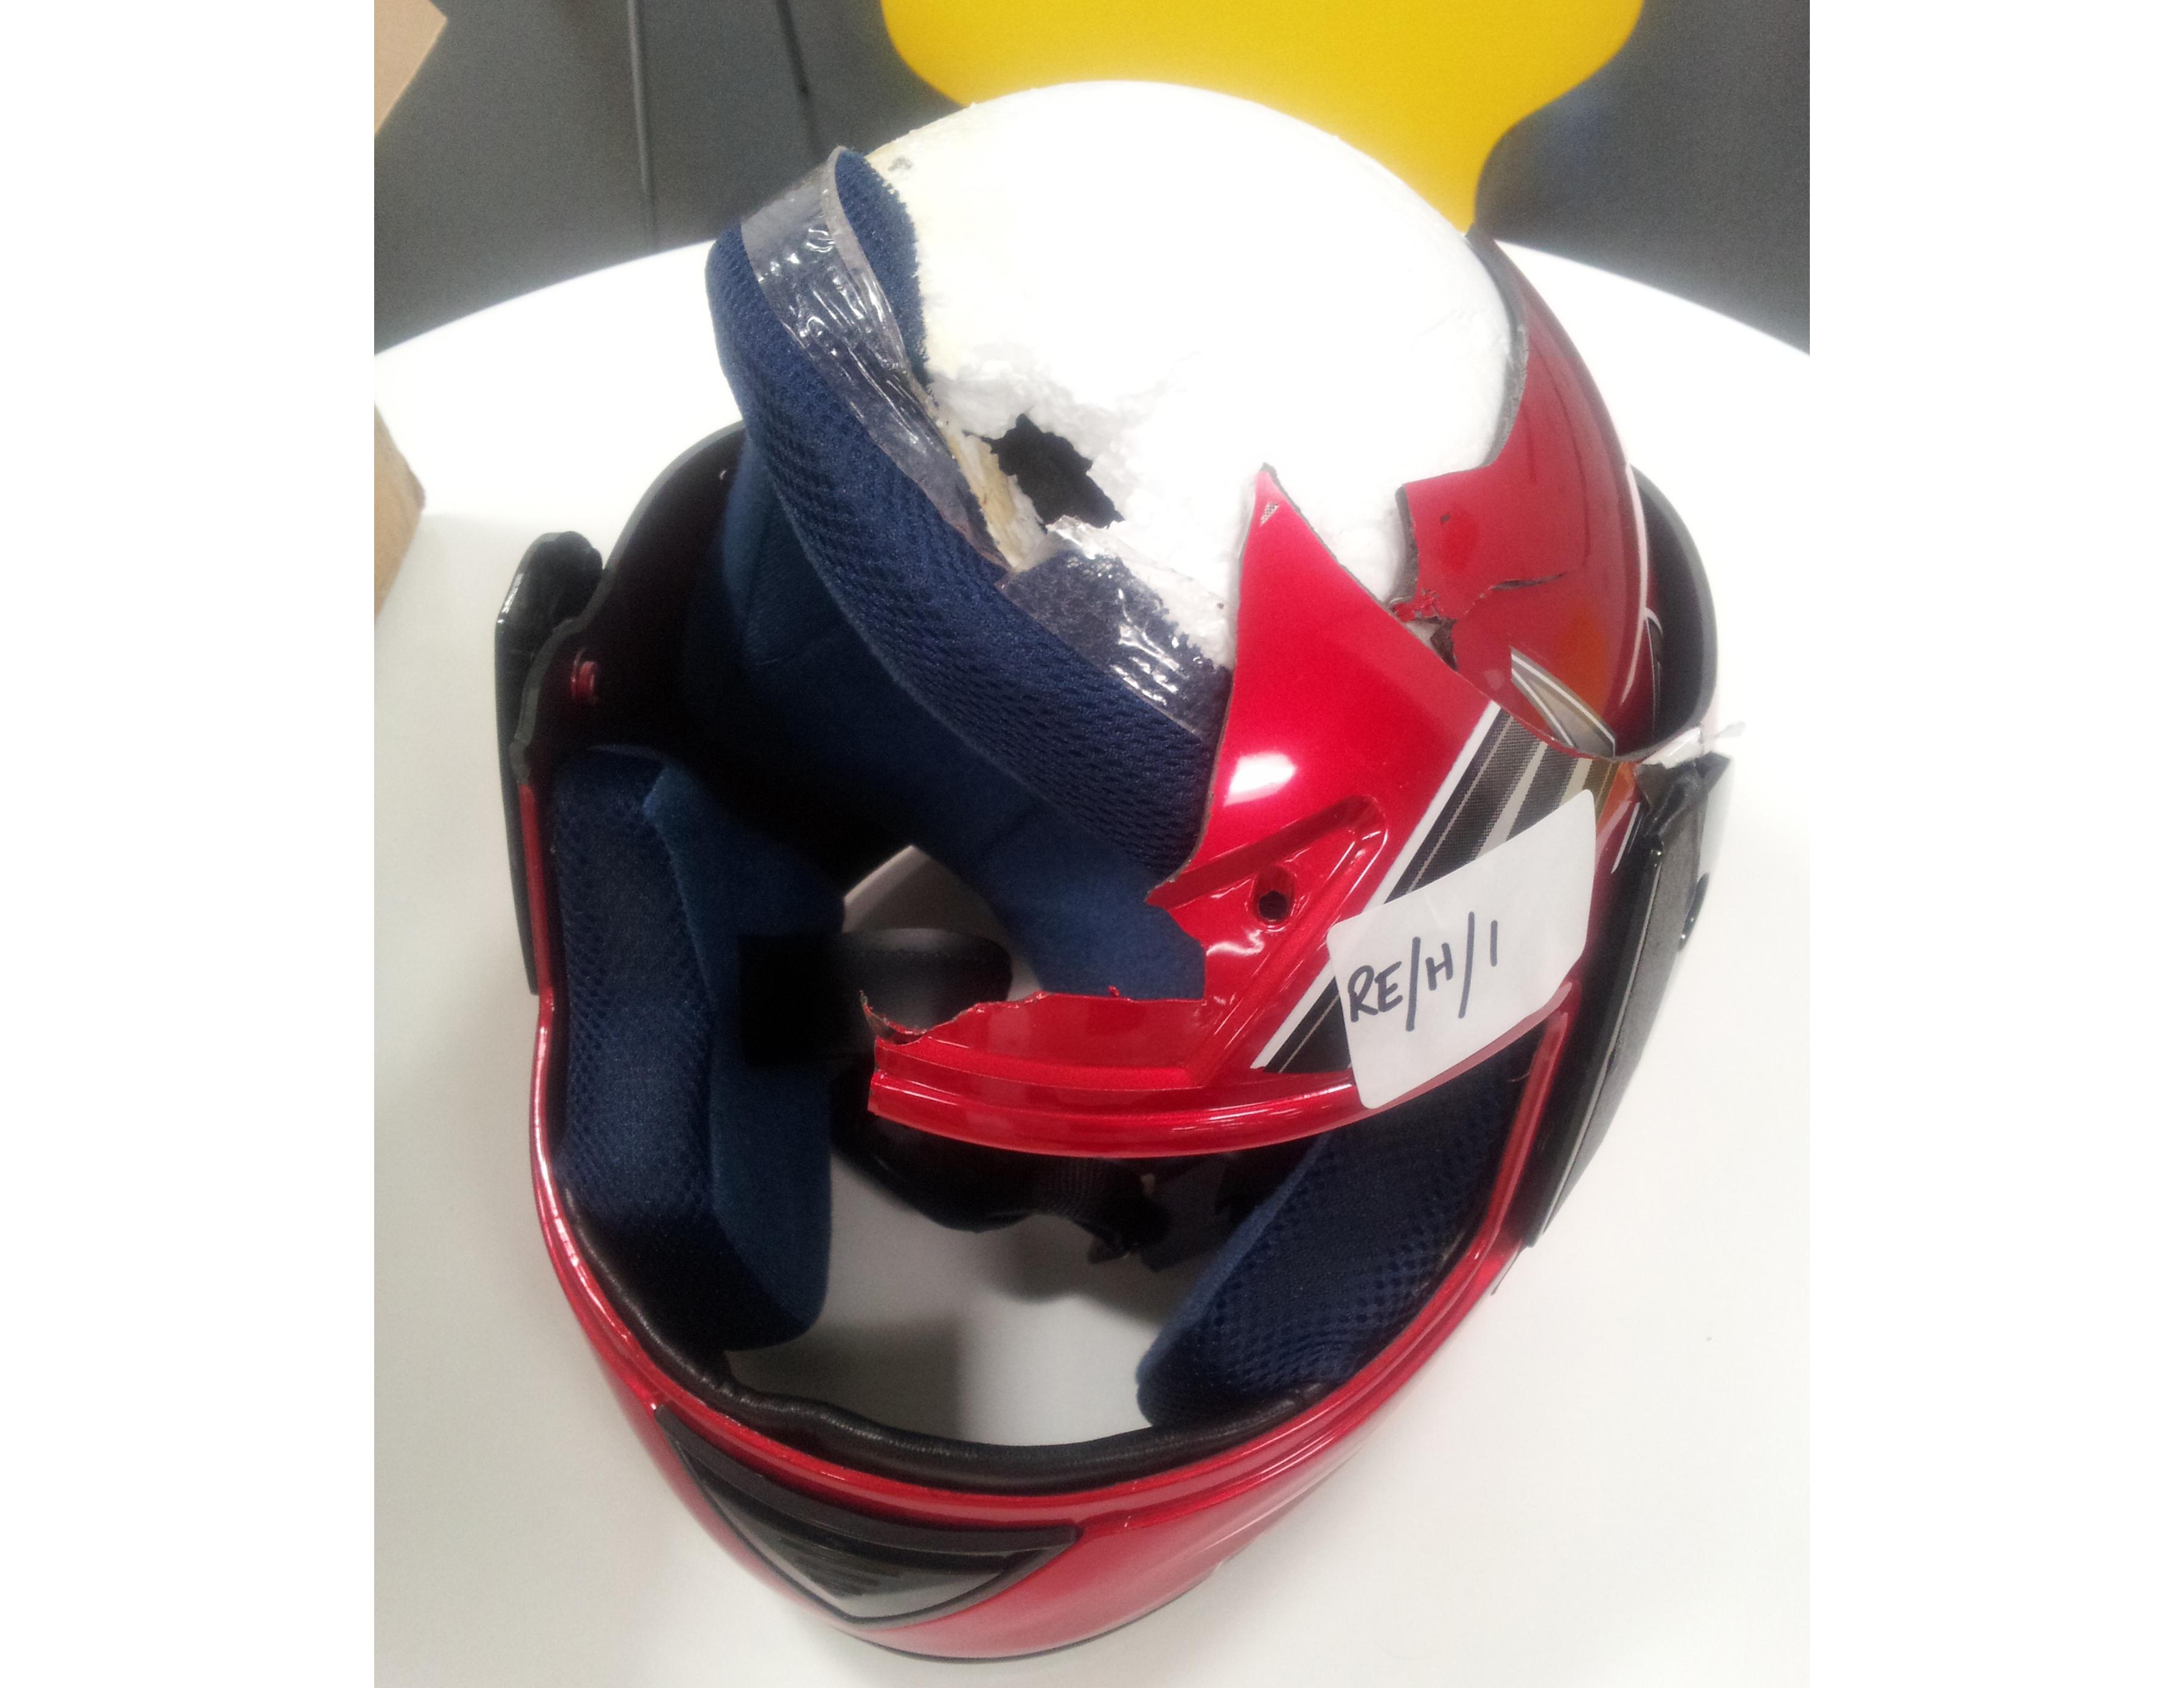 Dangerous helmet warning